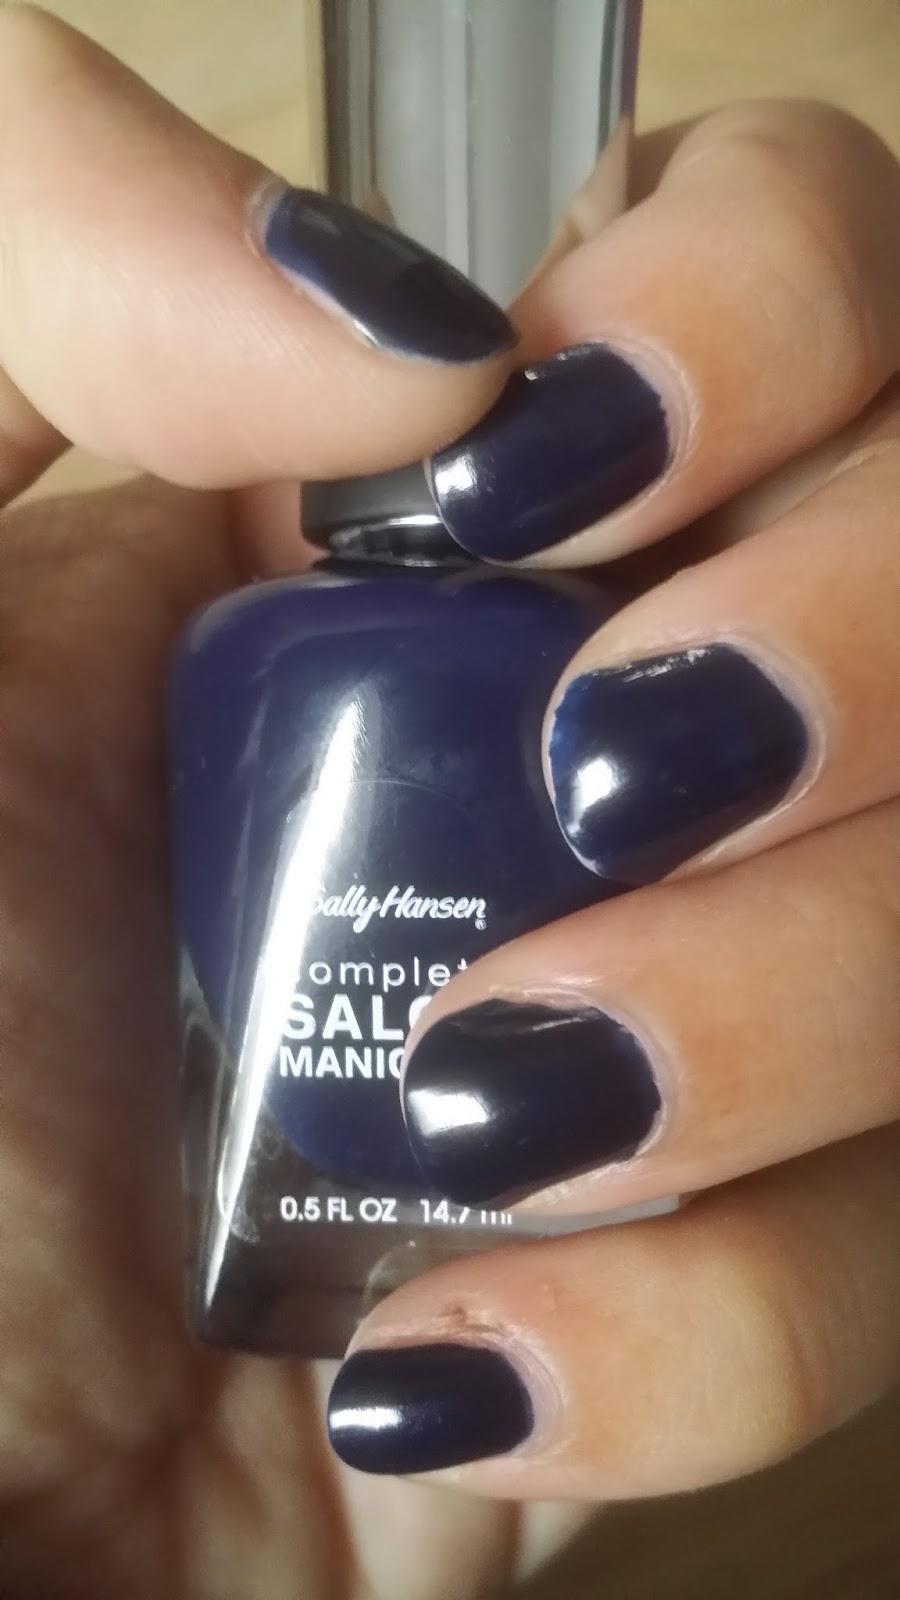 Nagellack dunkelblau; Swatch; Tragebild